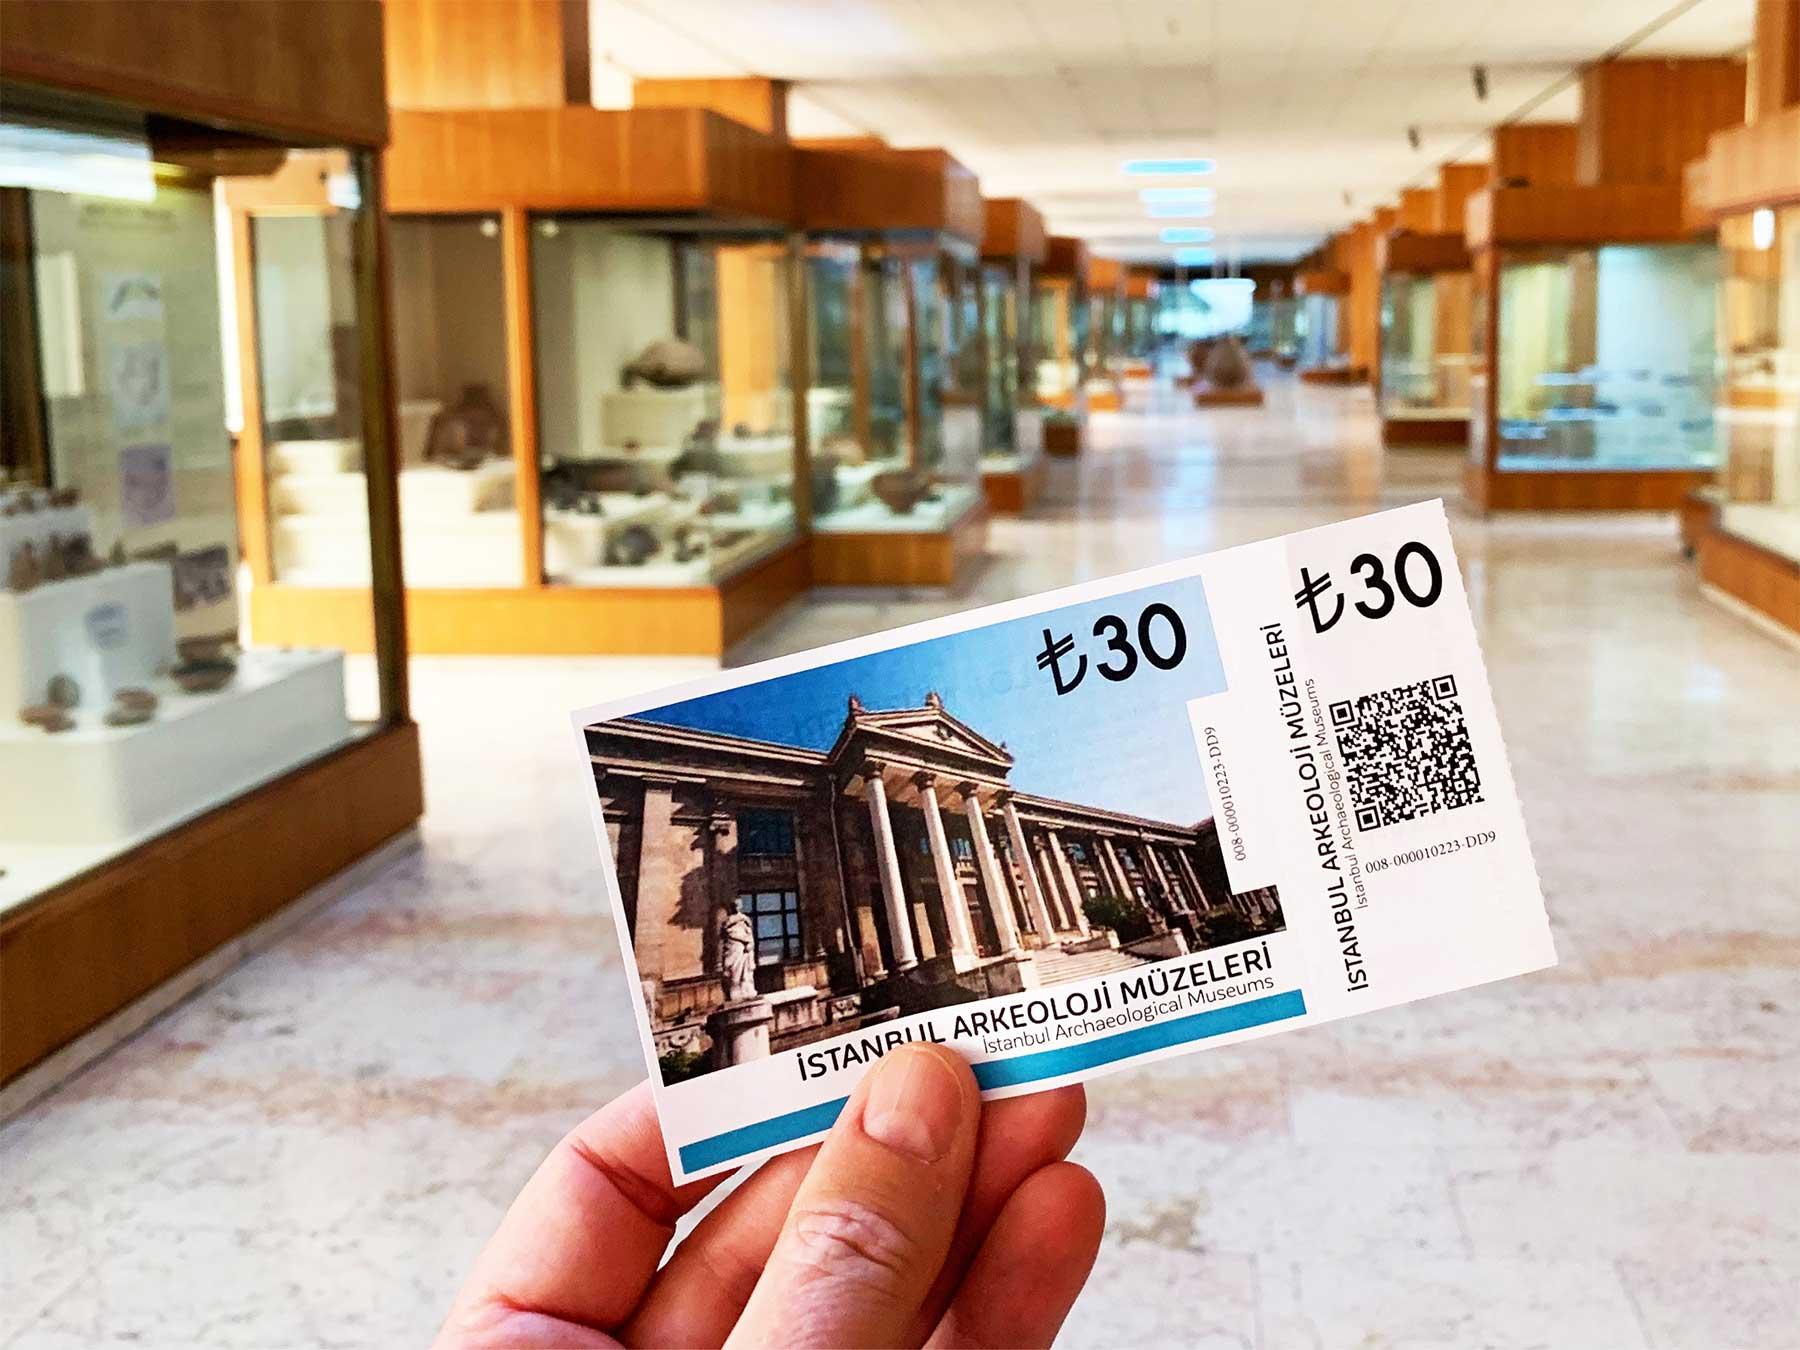 Istanbul Arkeoloji Muzeleri ticket | Istanbul Archaeological Museums ticket | Professor Steven Andrew Martin | Turkey research 2019